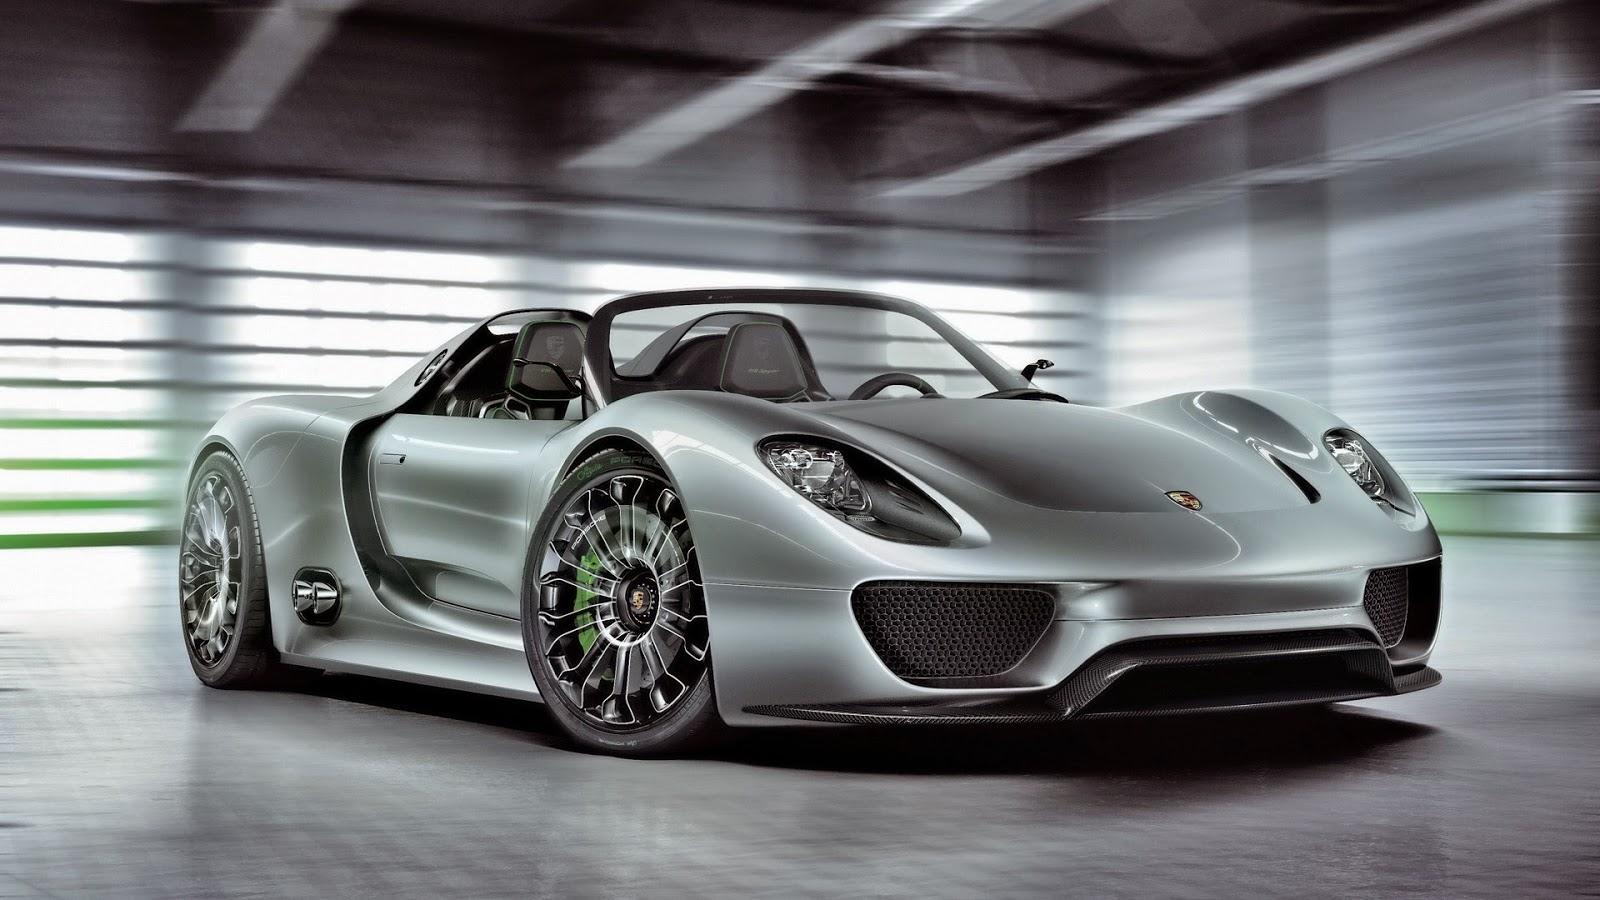 Porsche car high resolution pictures